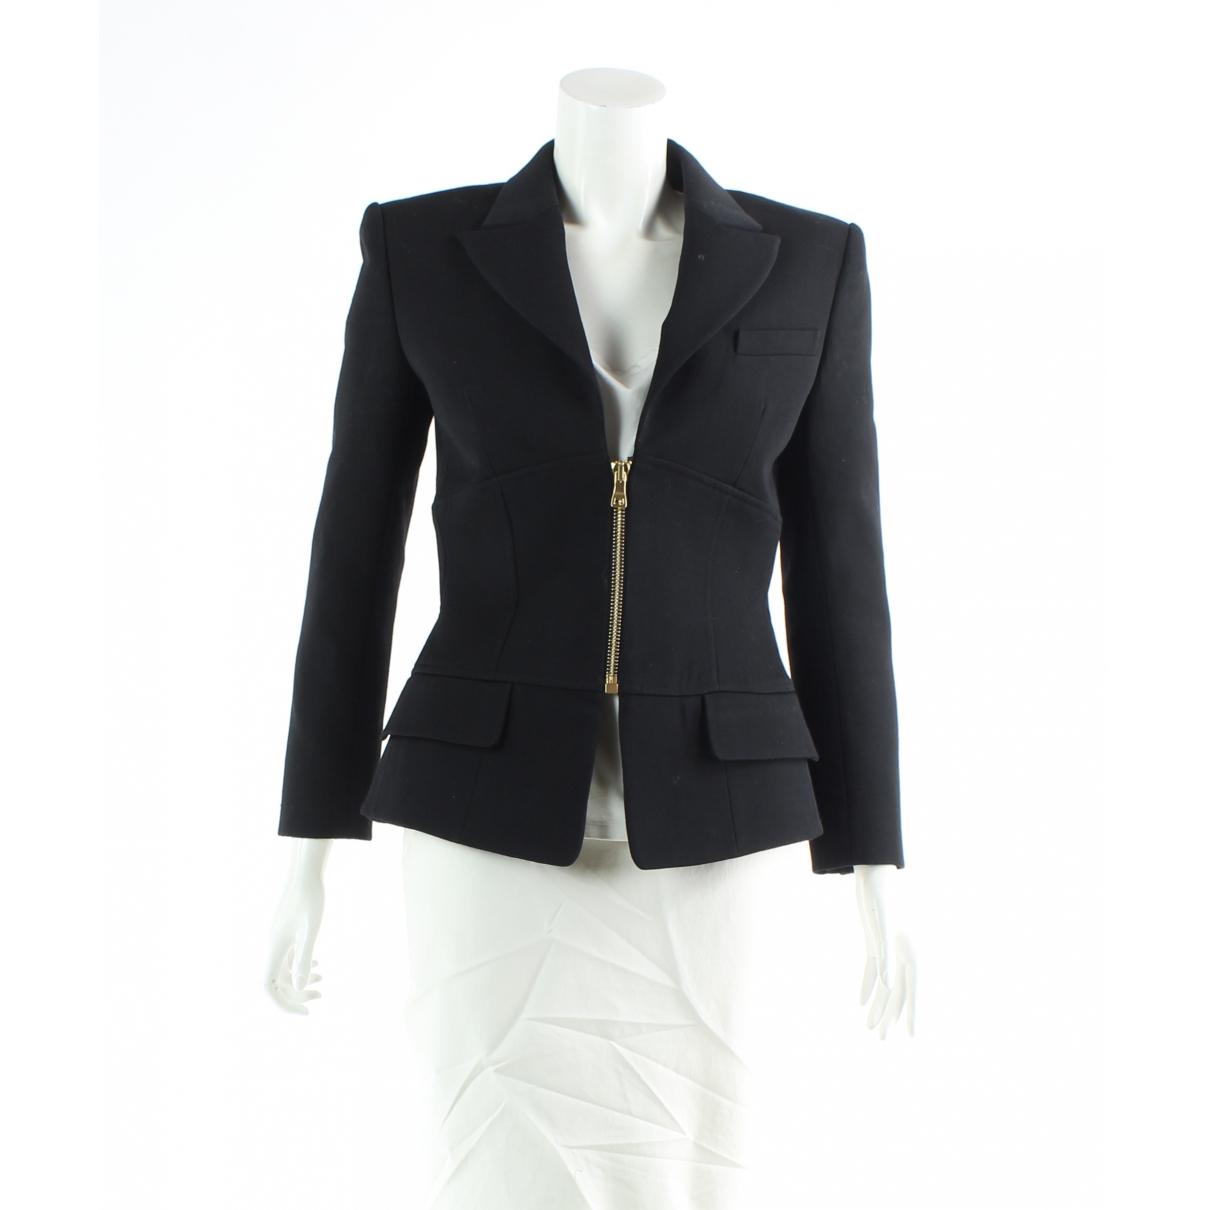 Balmain \N Black Wool jacket for Women 38 FR